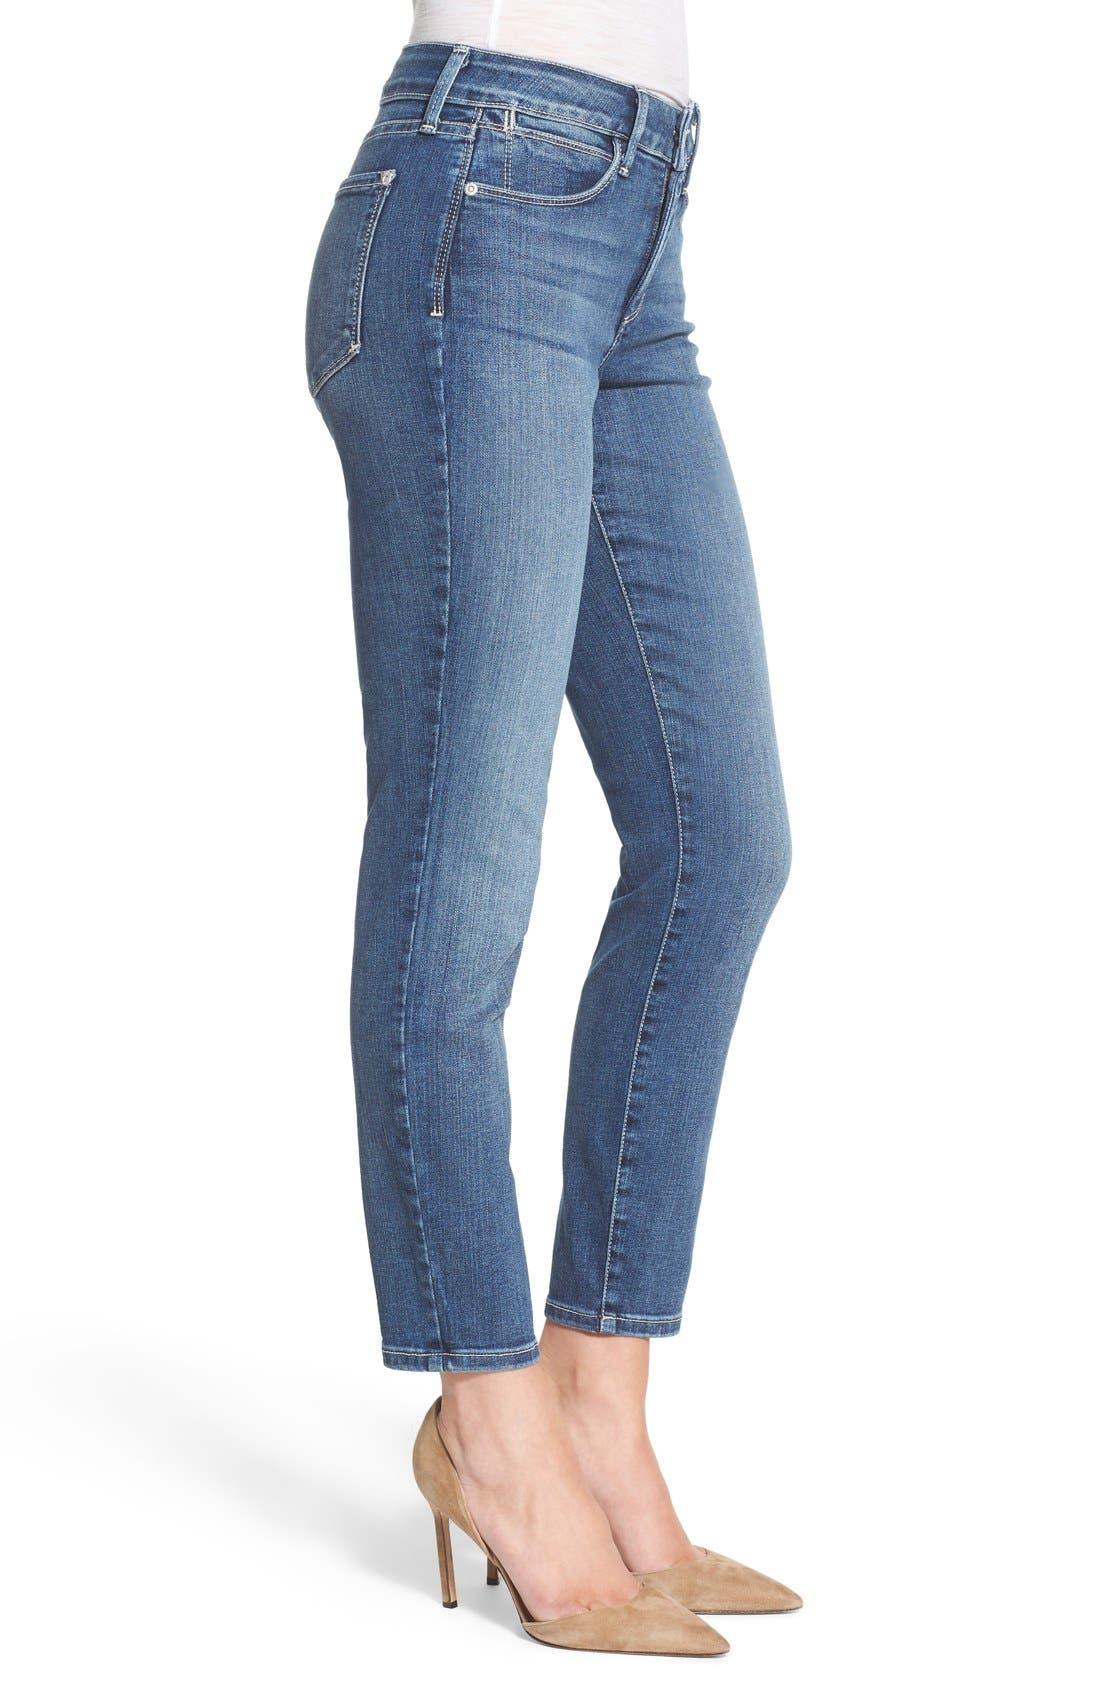 Alternate Image 3  - NYDJ 'Clarissa' Stretch Ankle Skinny Jeans (Heyburn) (Regular & Petite)